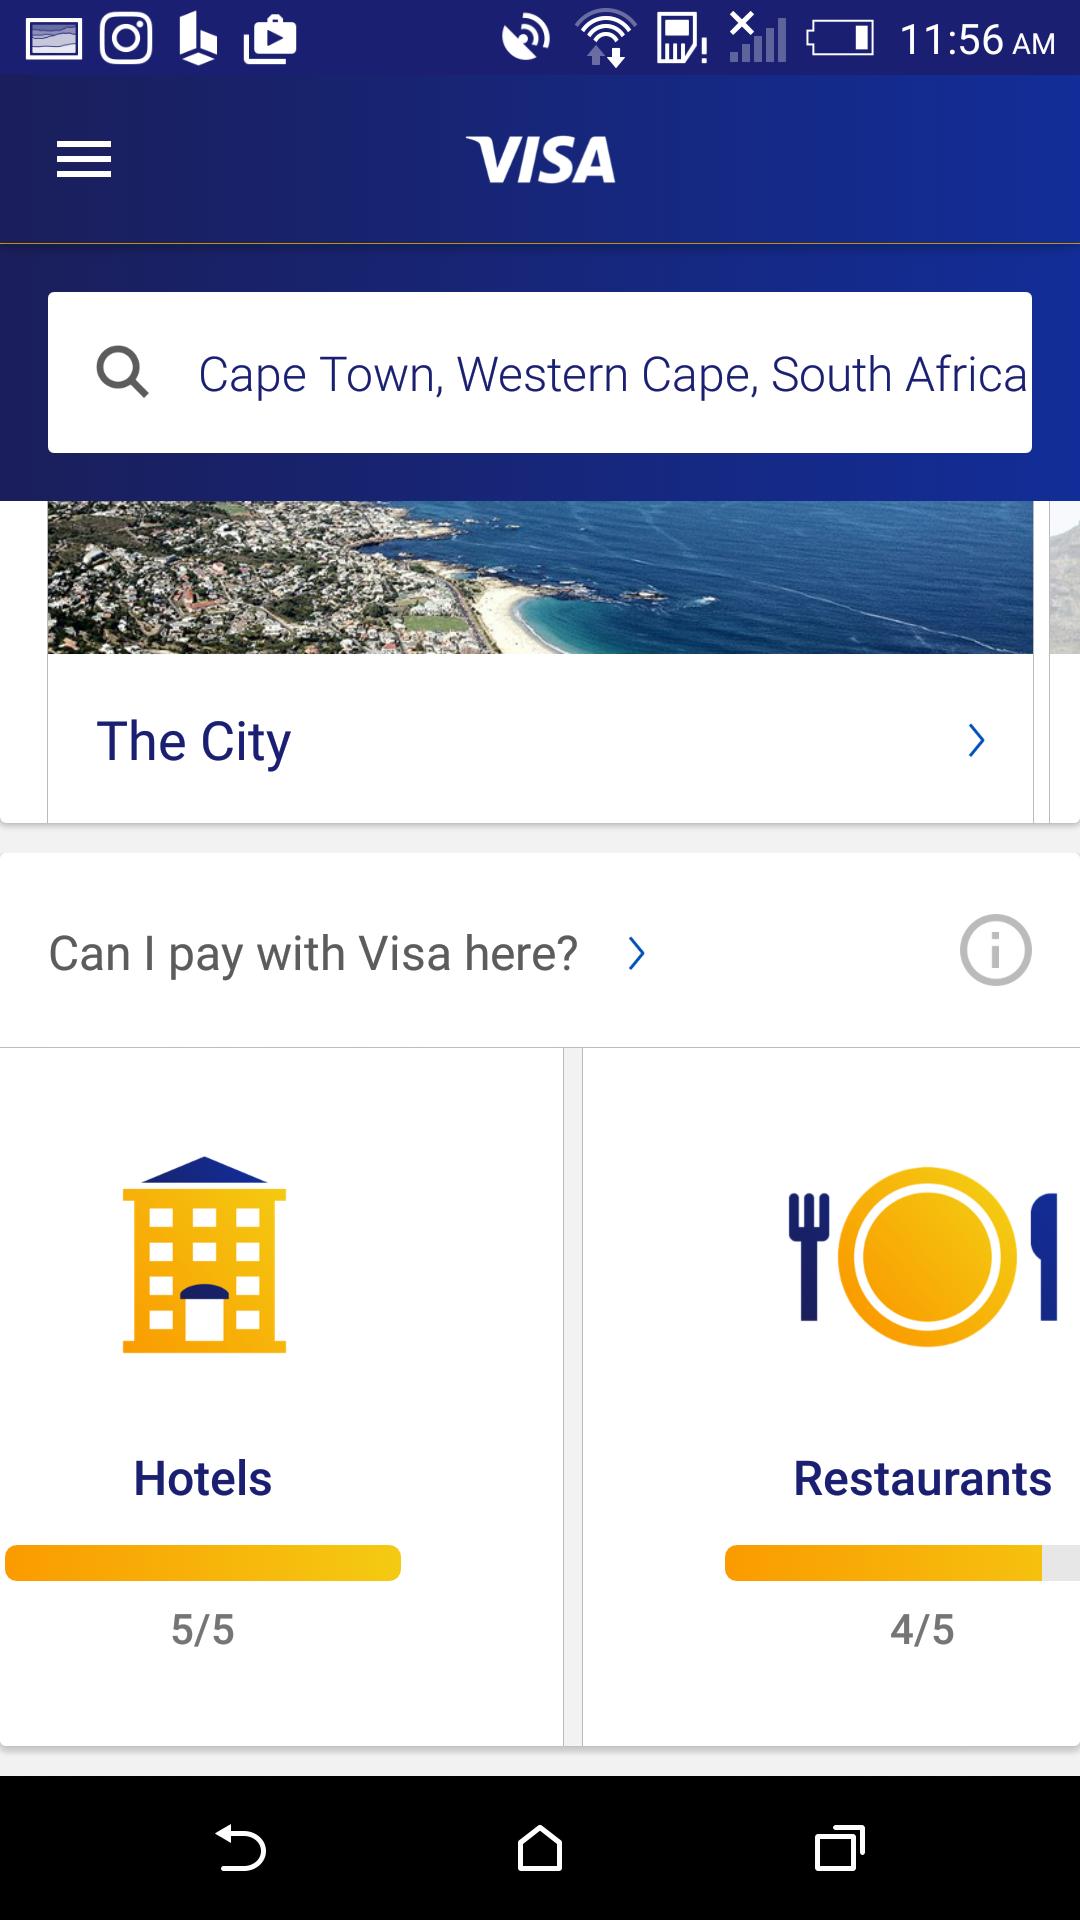 visa-travel-tools-3